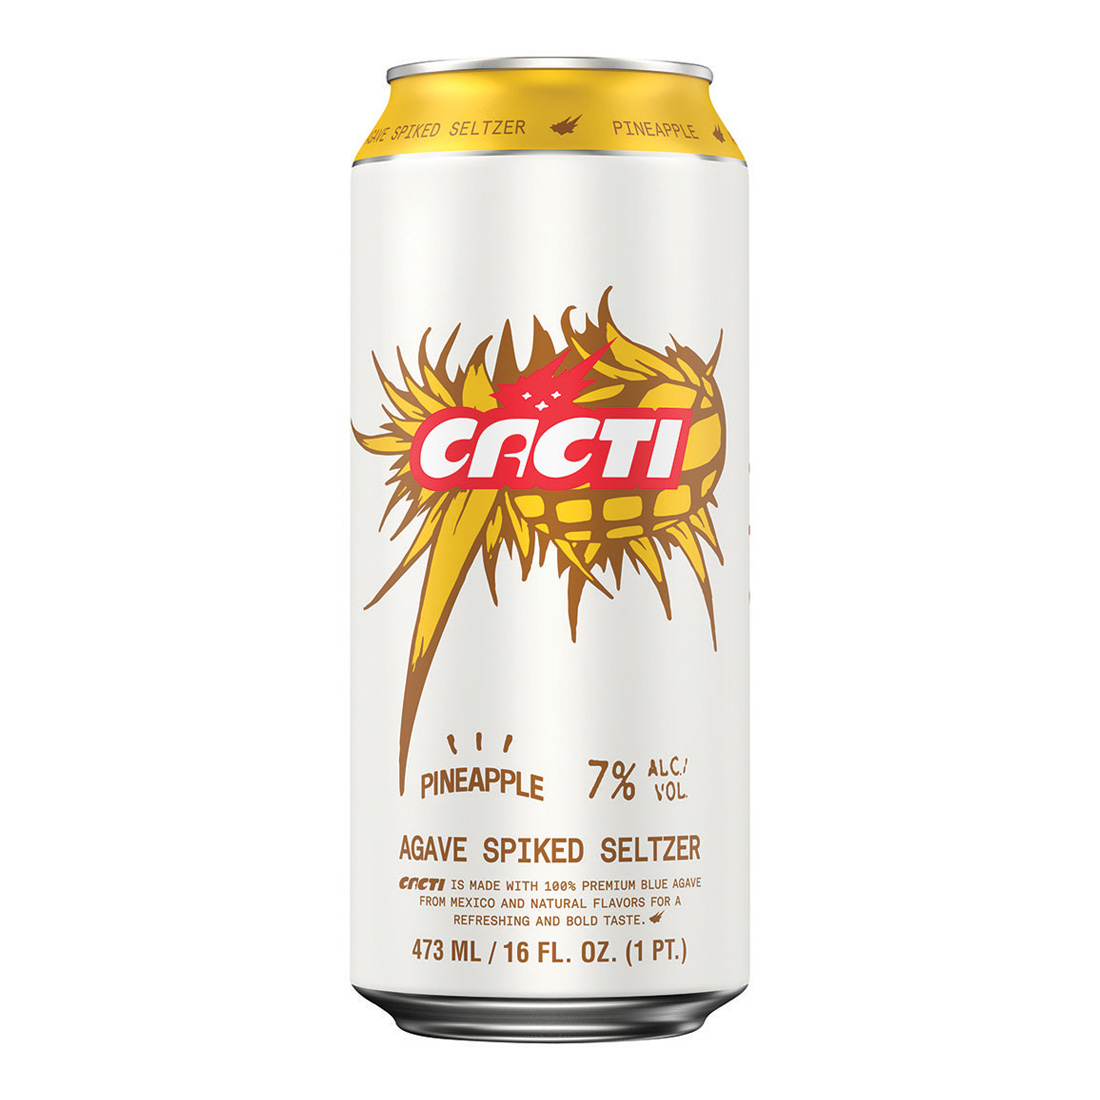 Cacti, Pineapple Seltzer